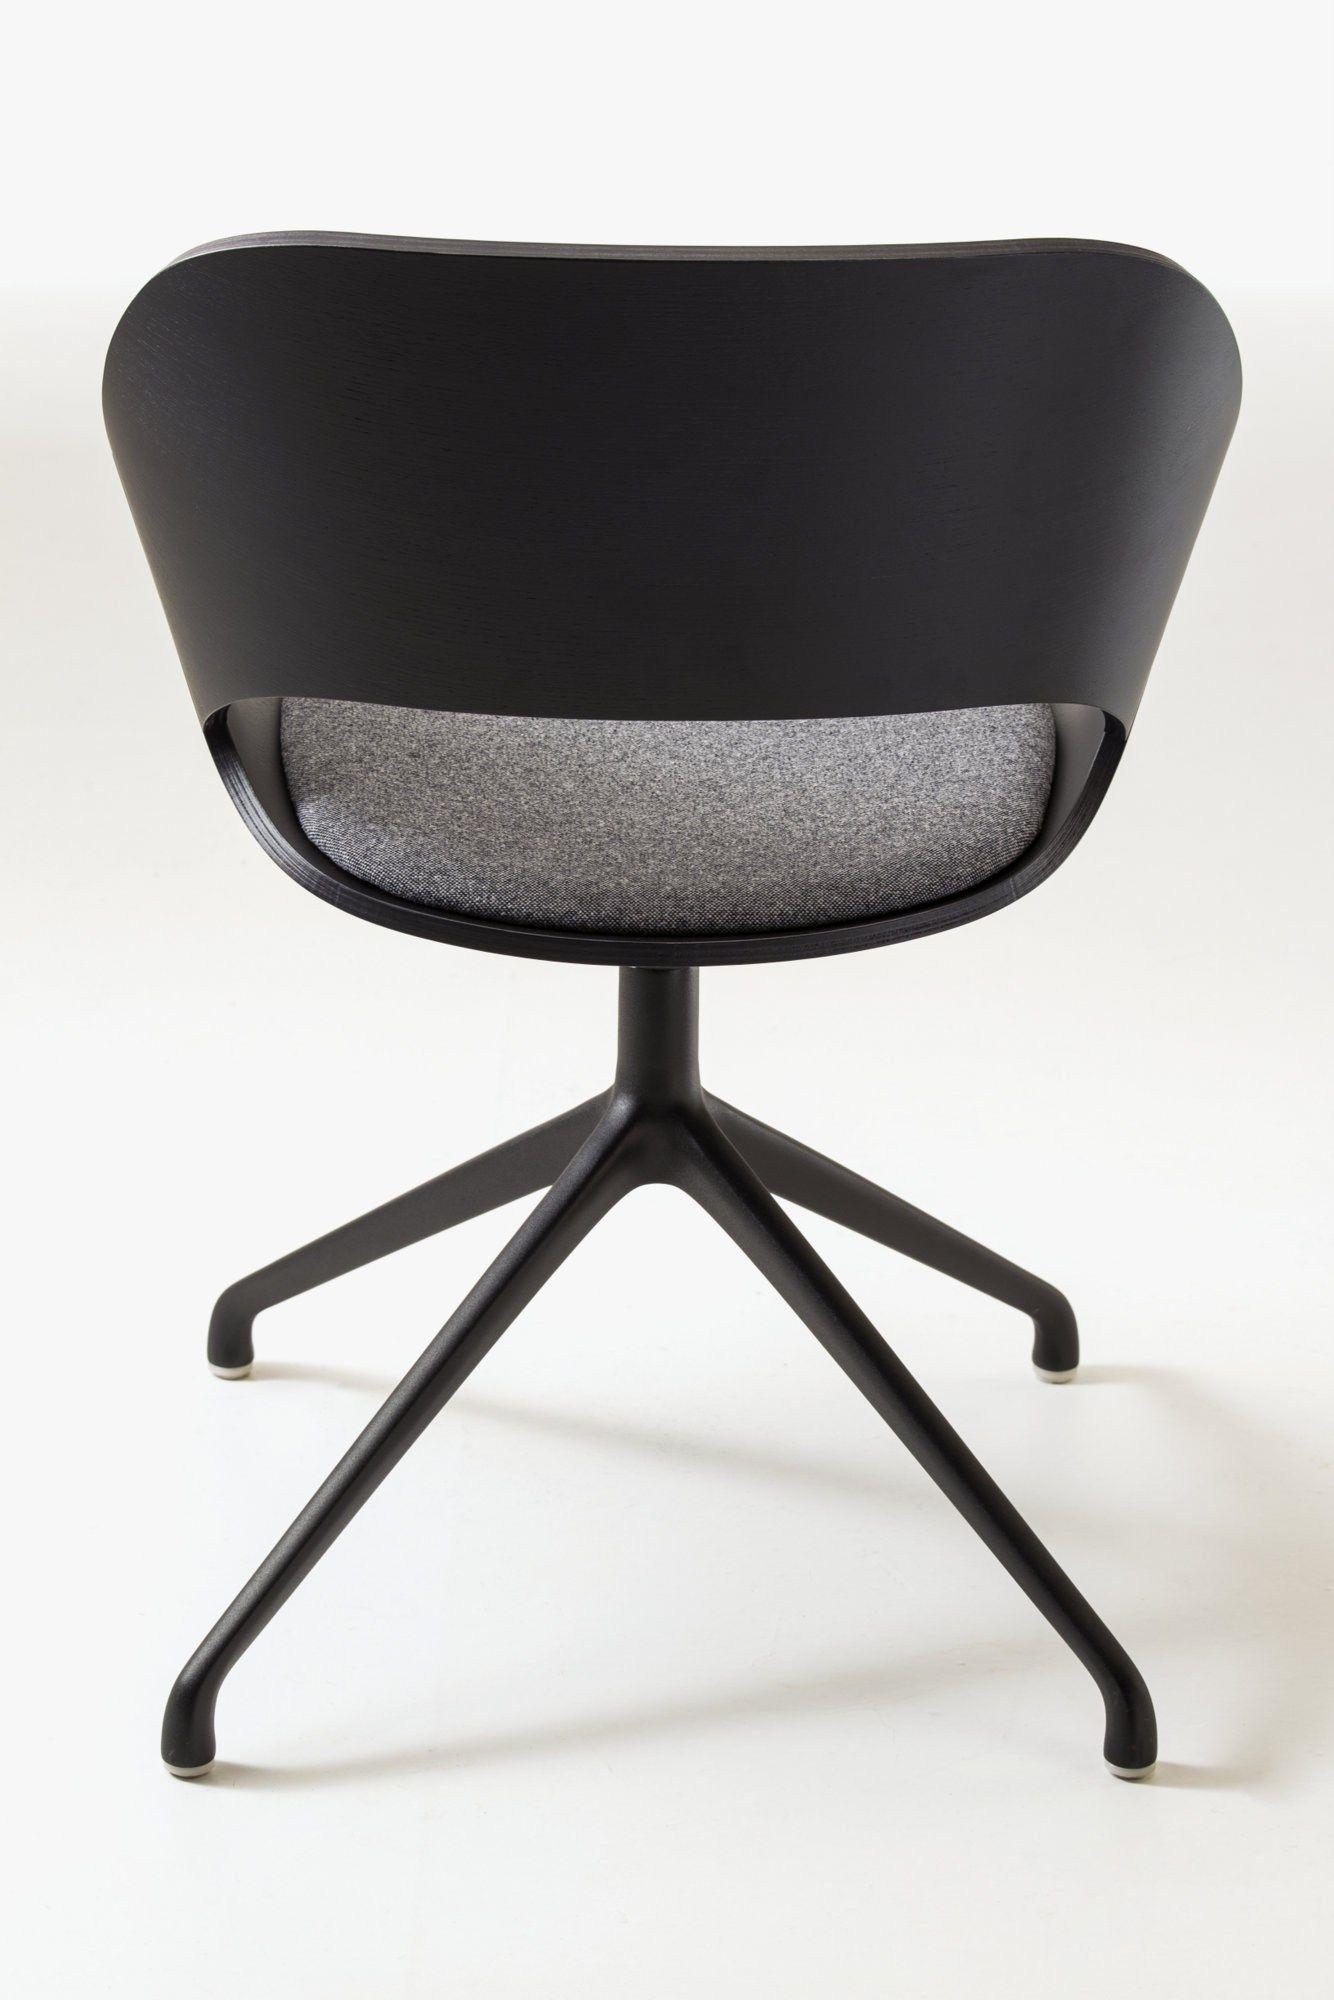 KABIRA SP   4 Speichen  Stuhl Kollektion Kabira By Arrmet Design Kensaku  Oshiro